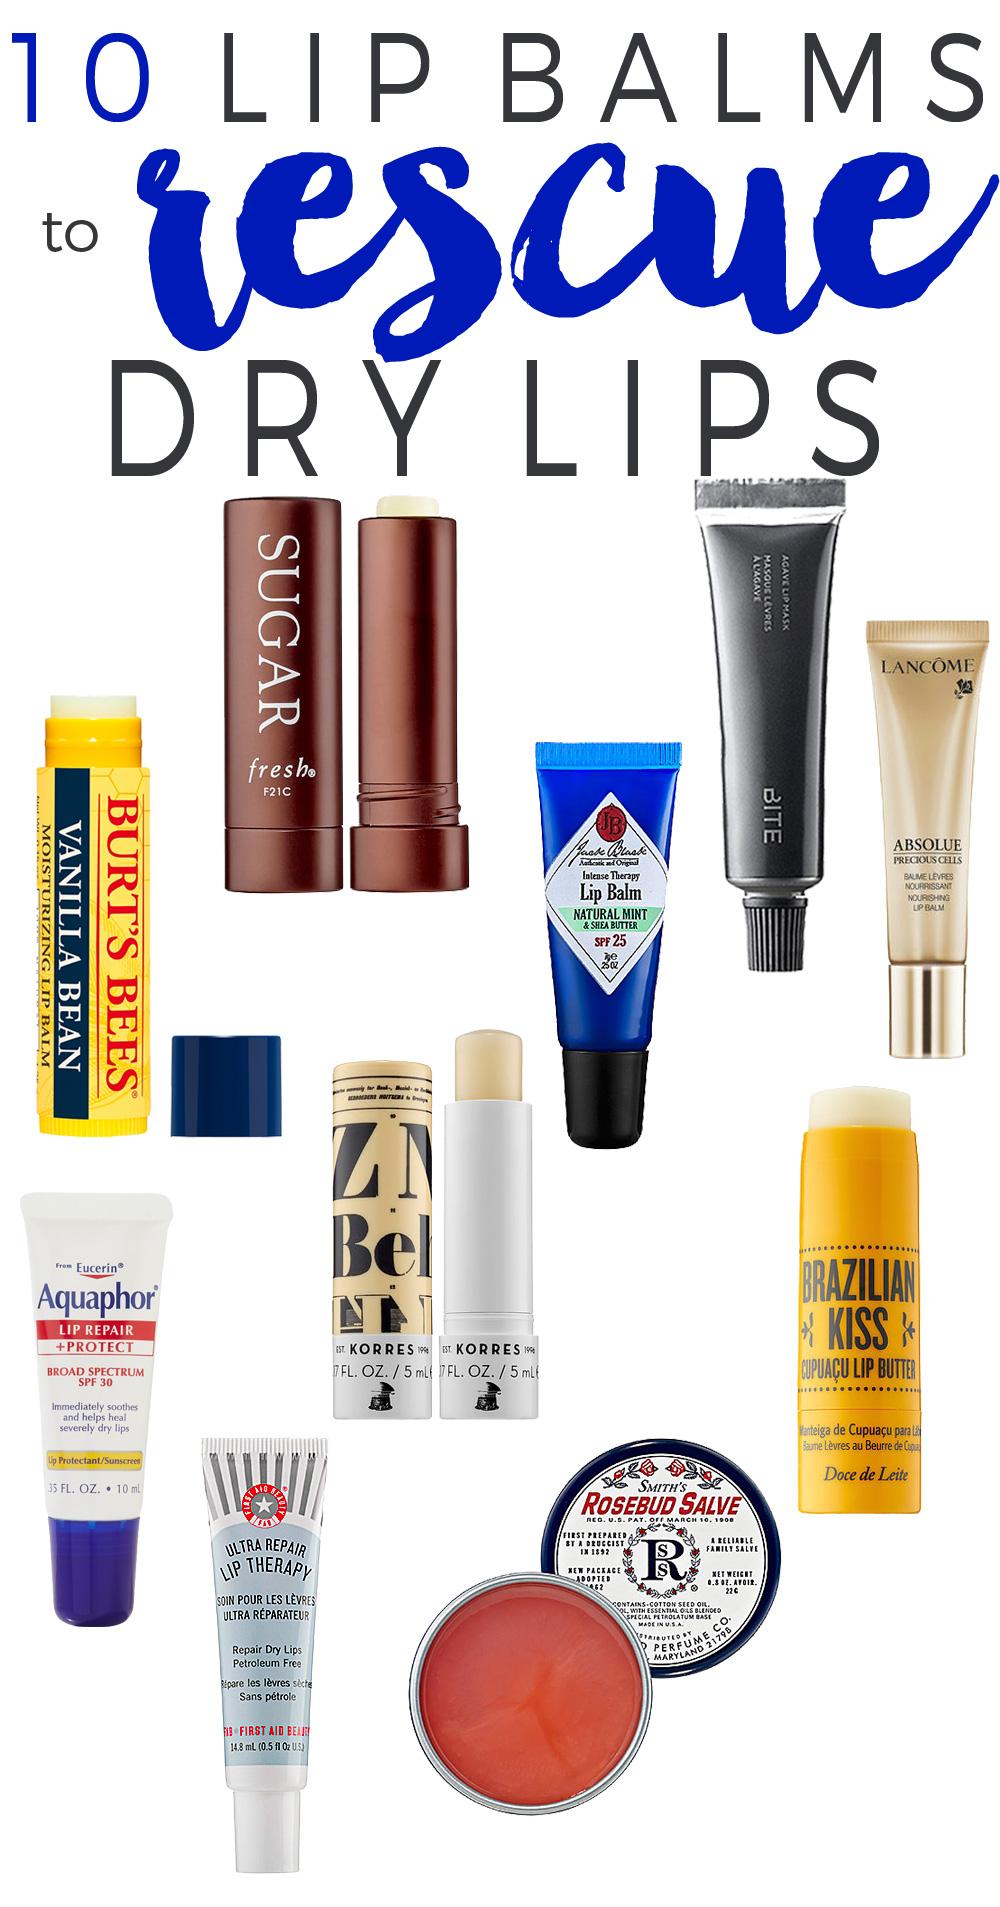 10 Lip Balms to Rescue Dry Lips